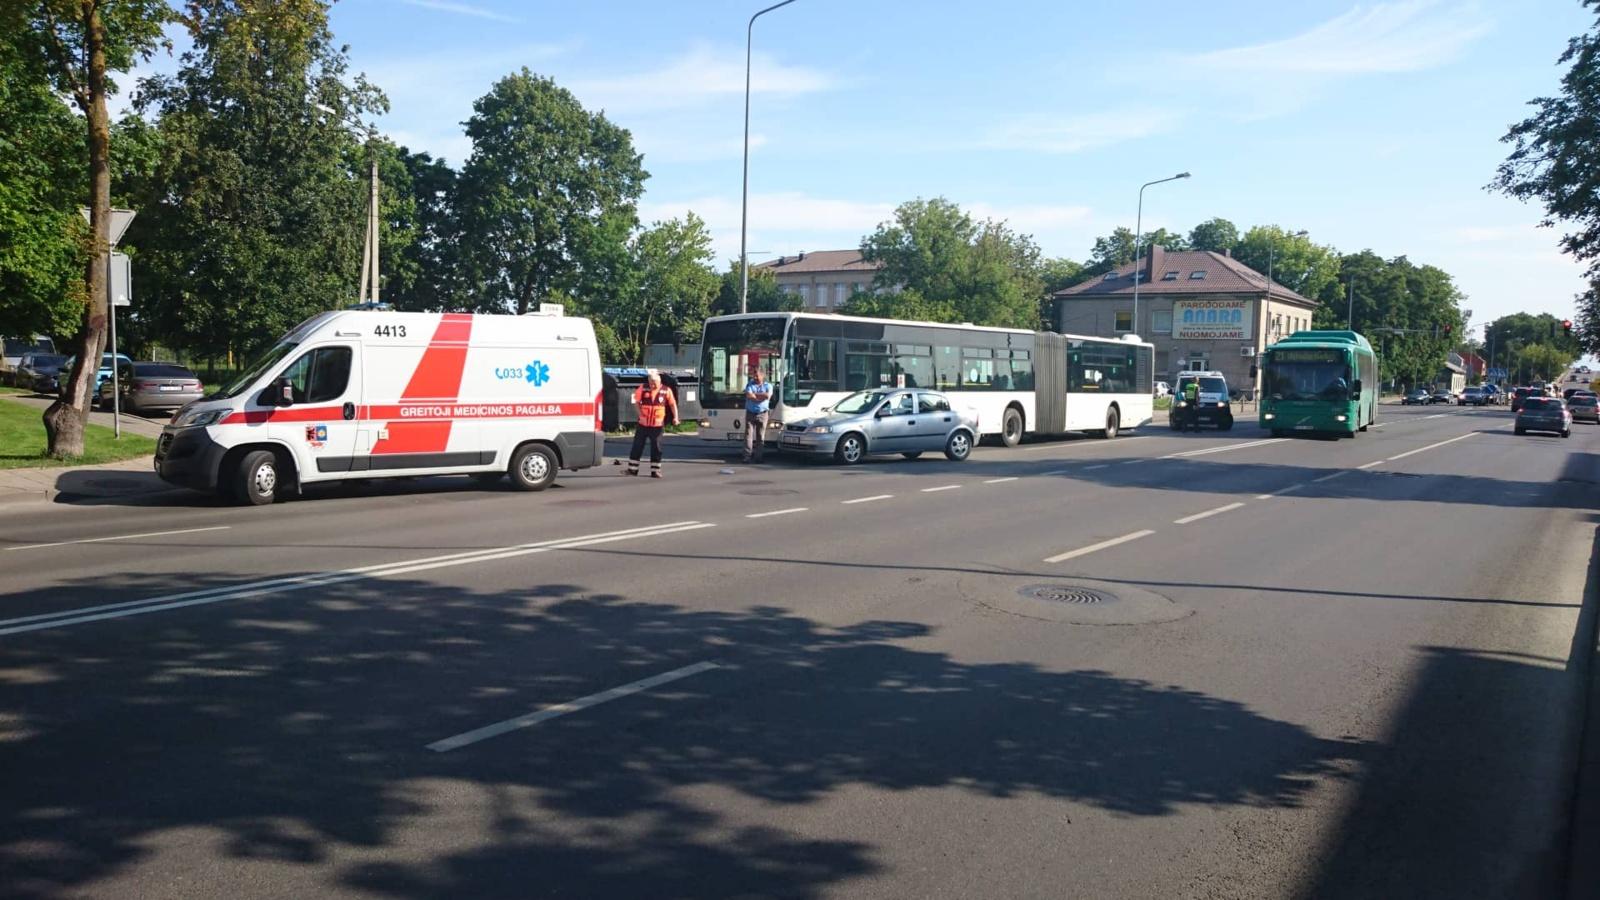 Avarija Tilžės gatvėje: susidūrė automobilis ir autobusas (vaizdo įrašas)